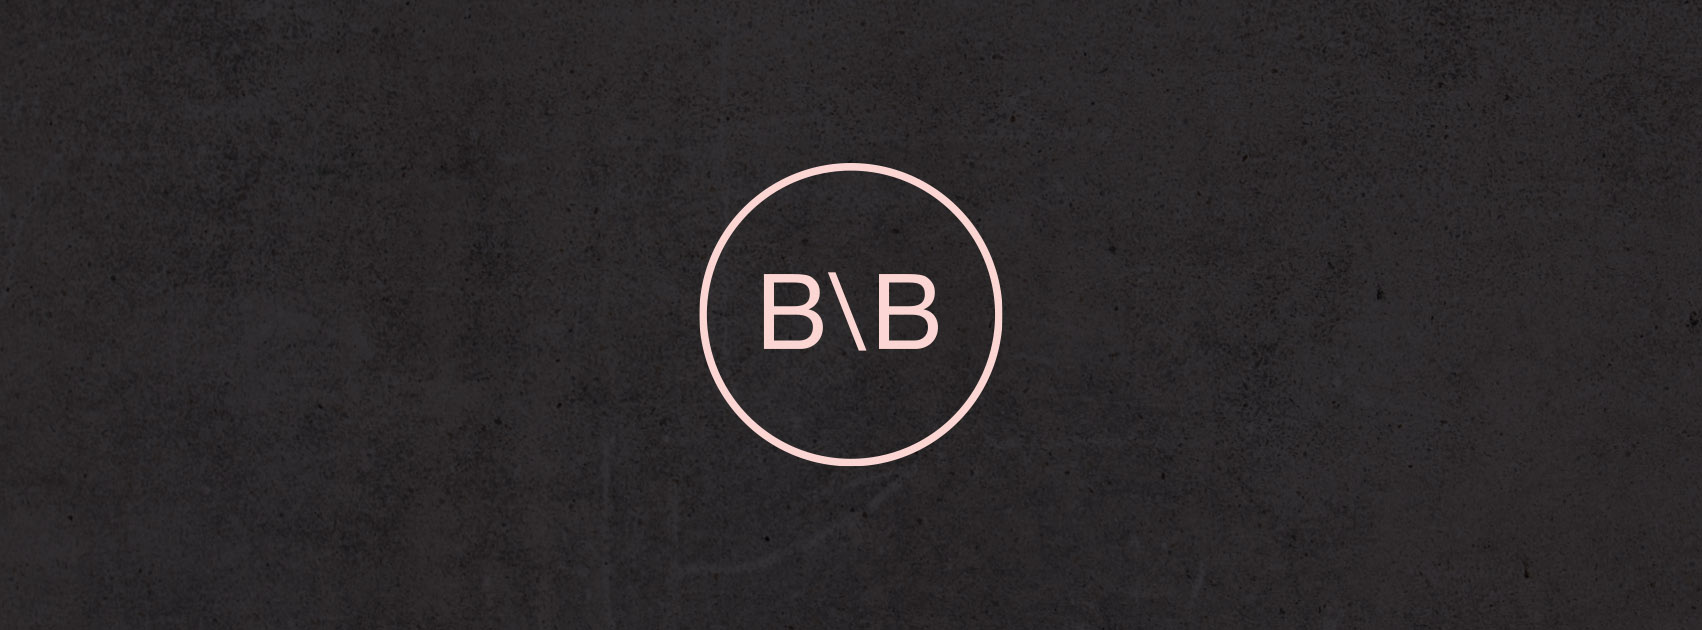 bbweb.jpg